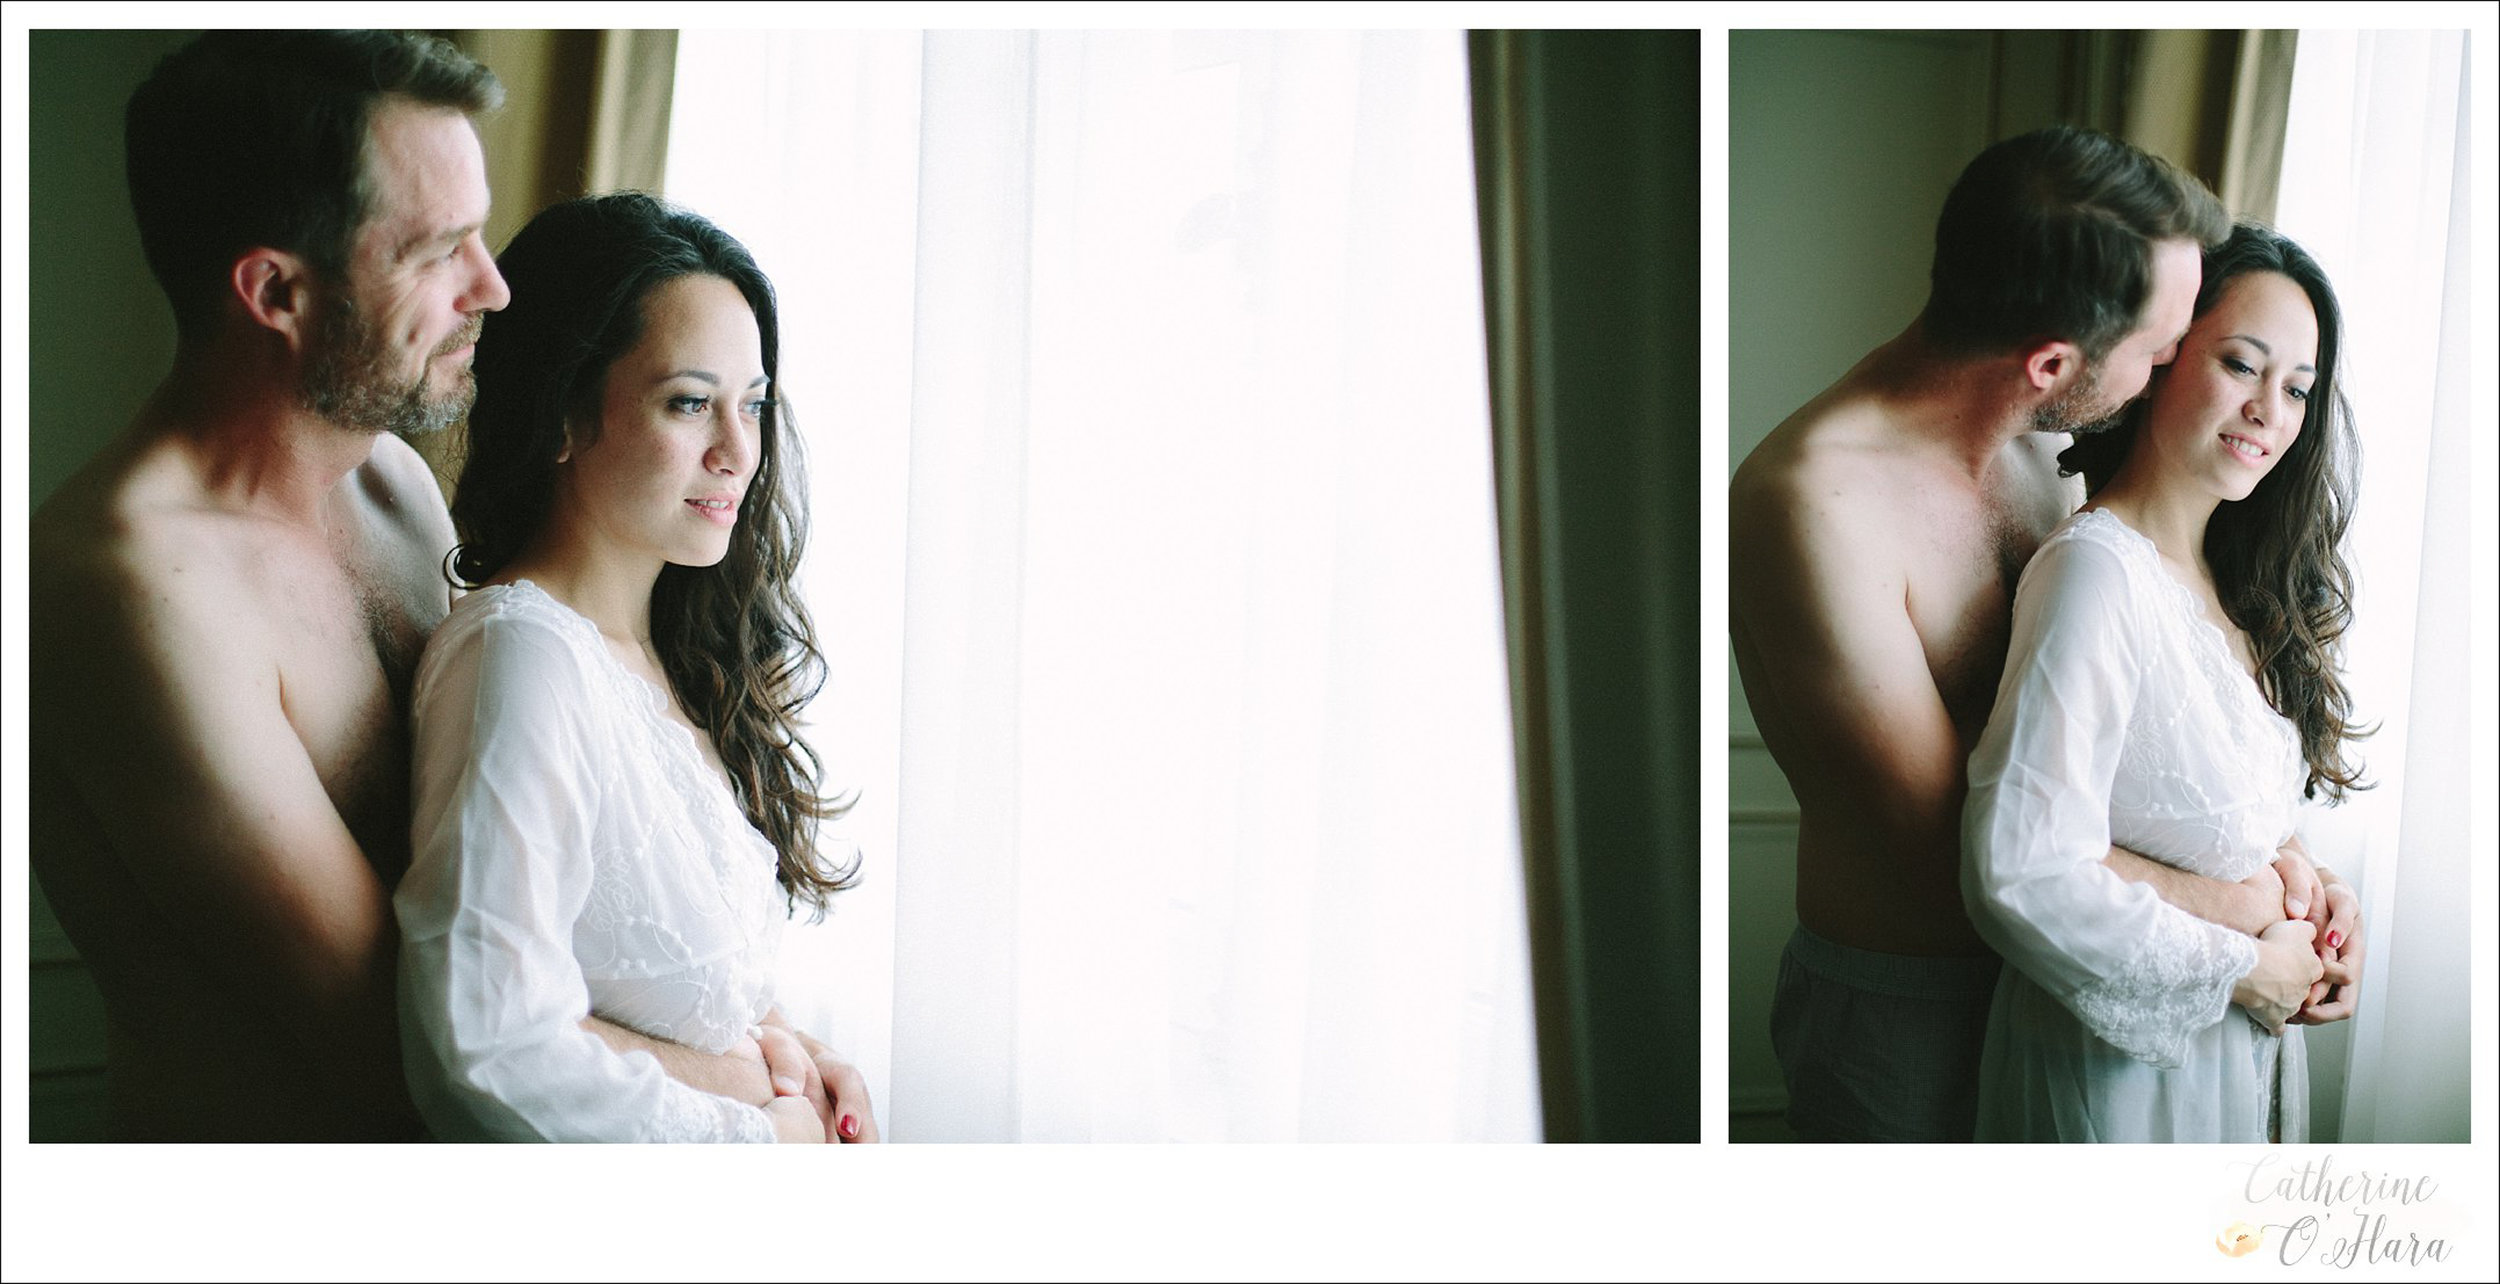 13-paris-couples-boudoir-photographer.jpg